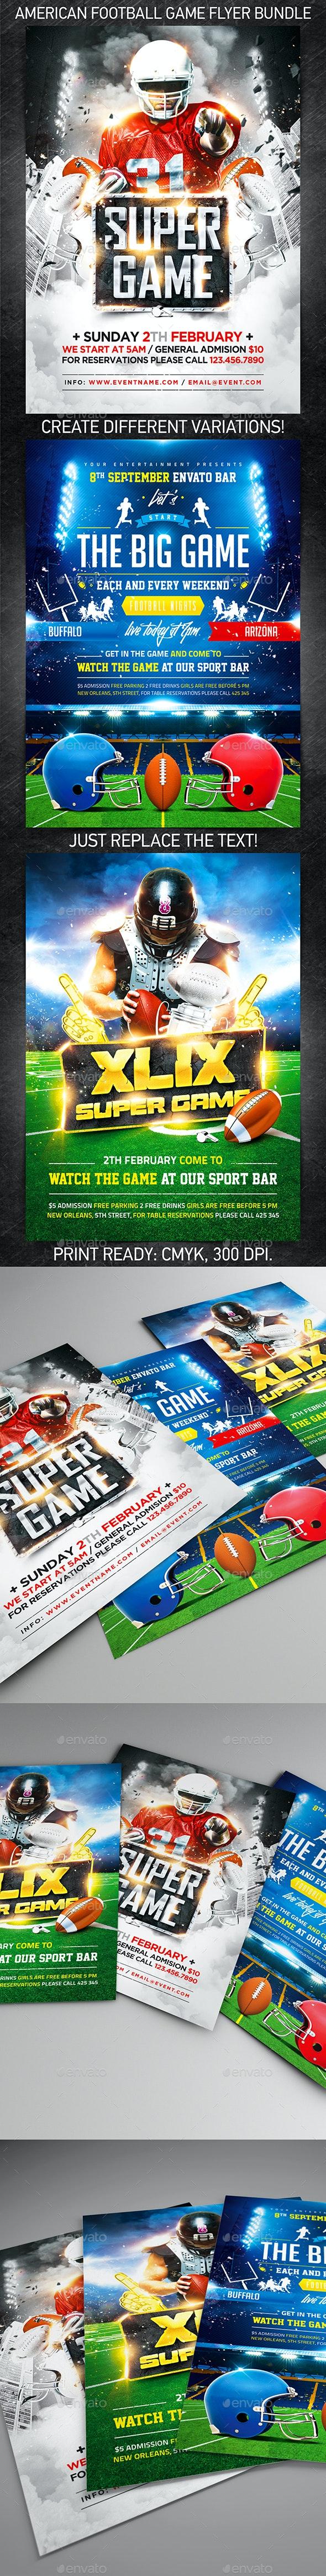 American Football Game Flyer Bundle - Flyers Print Templates